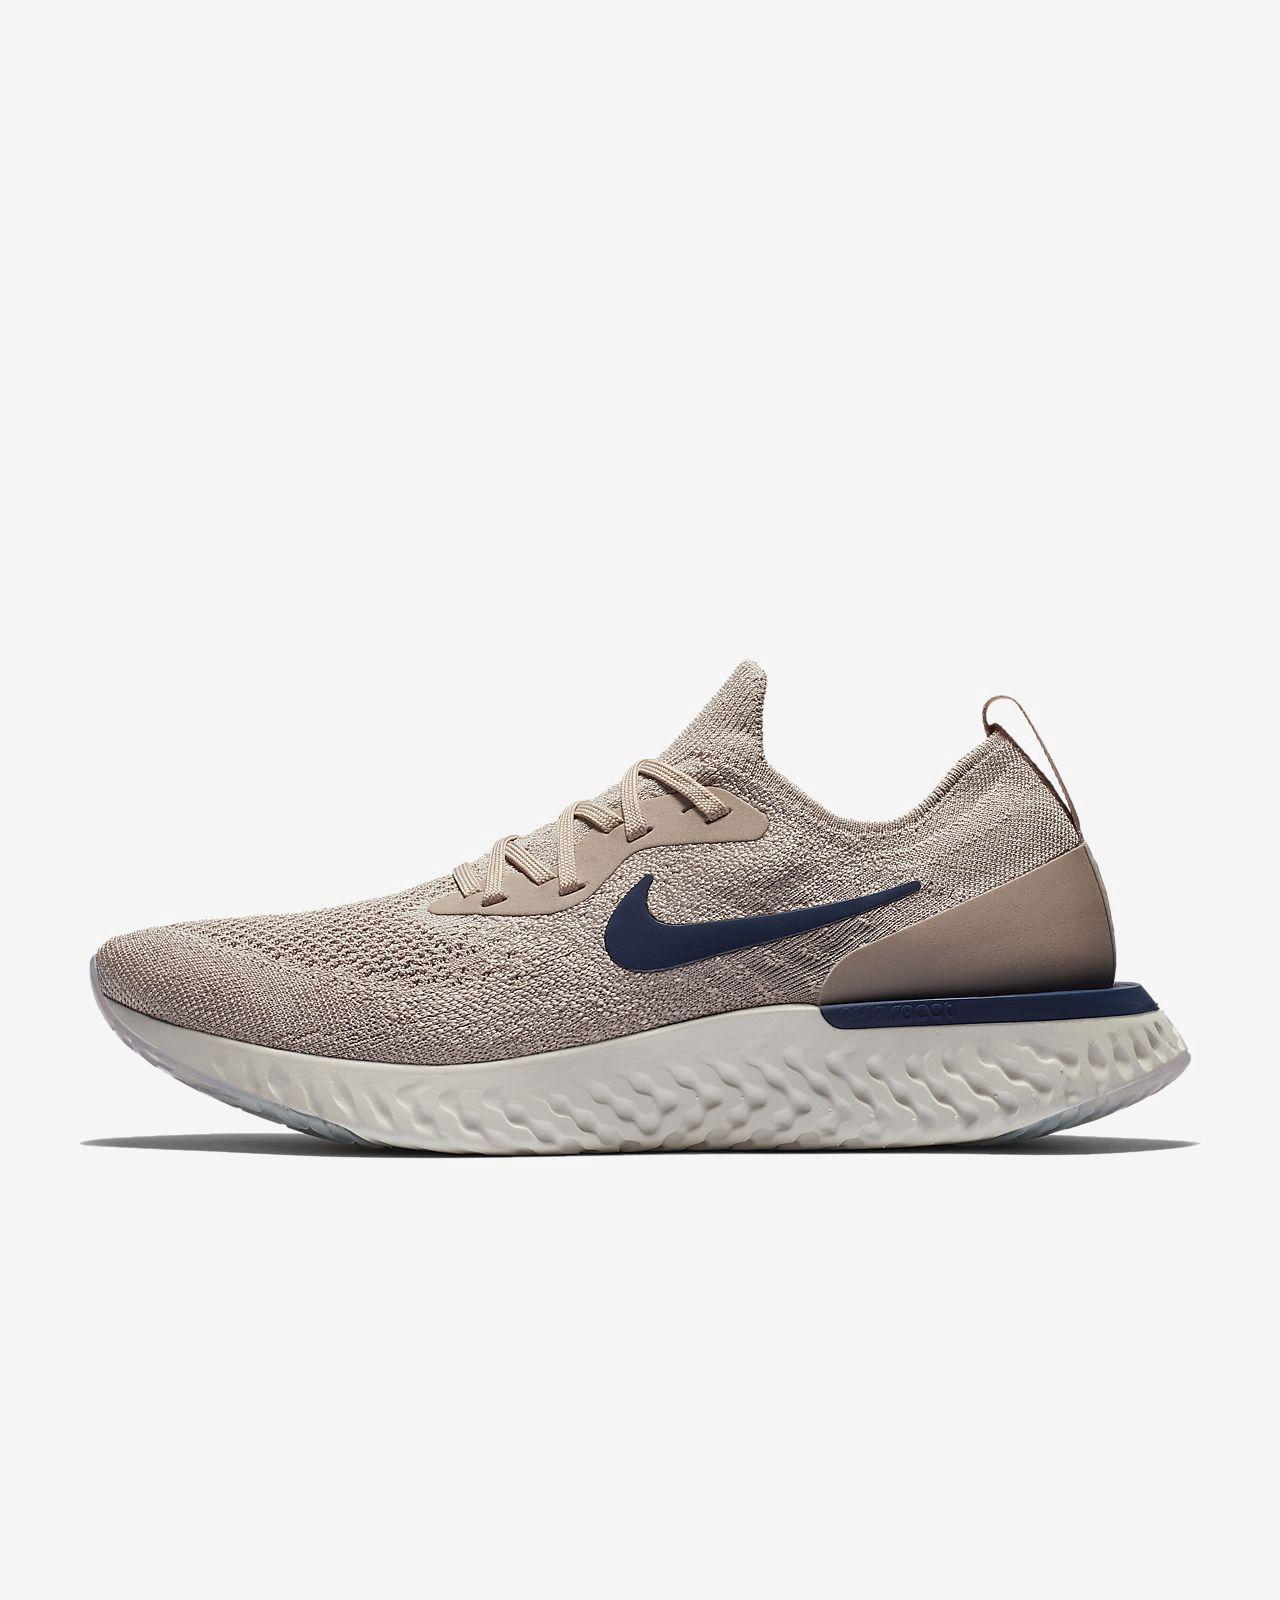 5a9bfed45aa2 Nike Epic React Flyknit Men s Running Shoe - 12.5